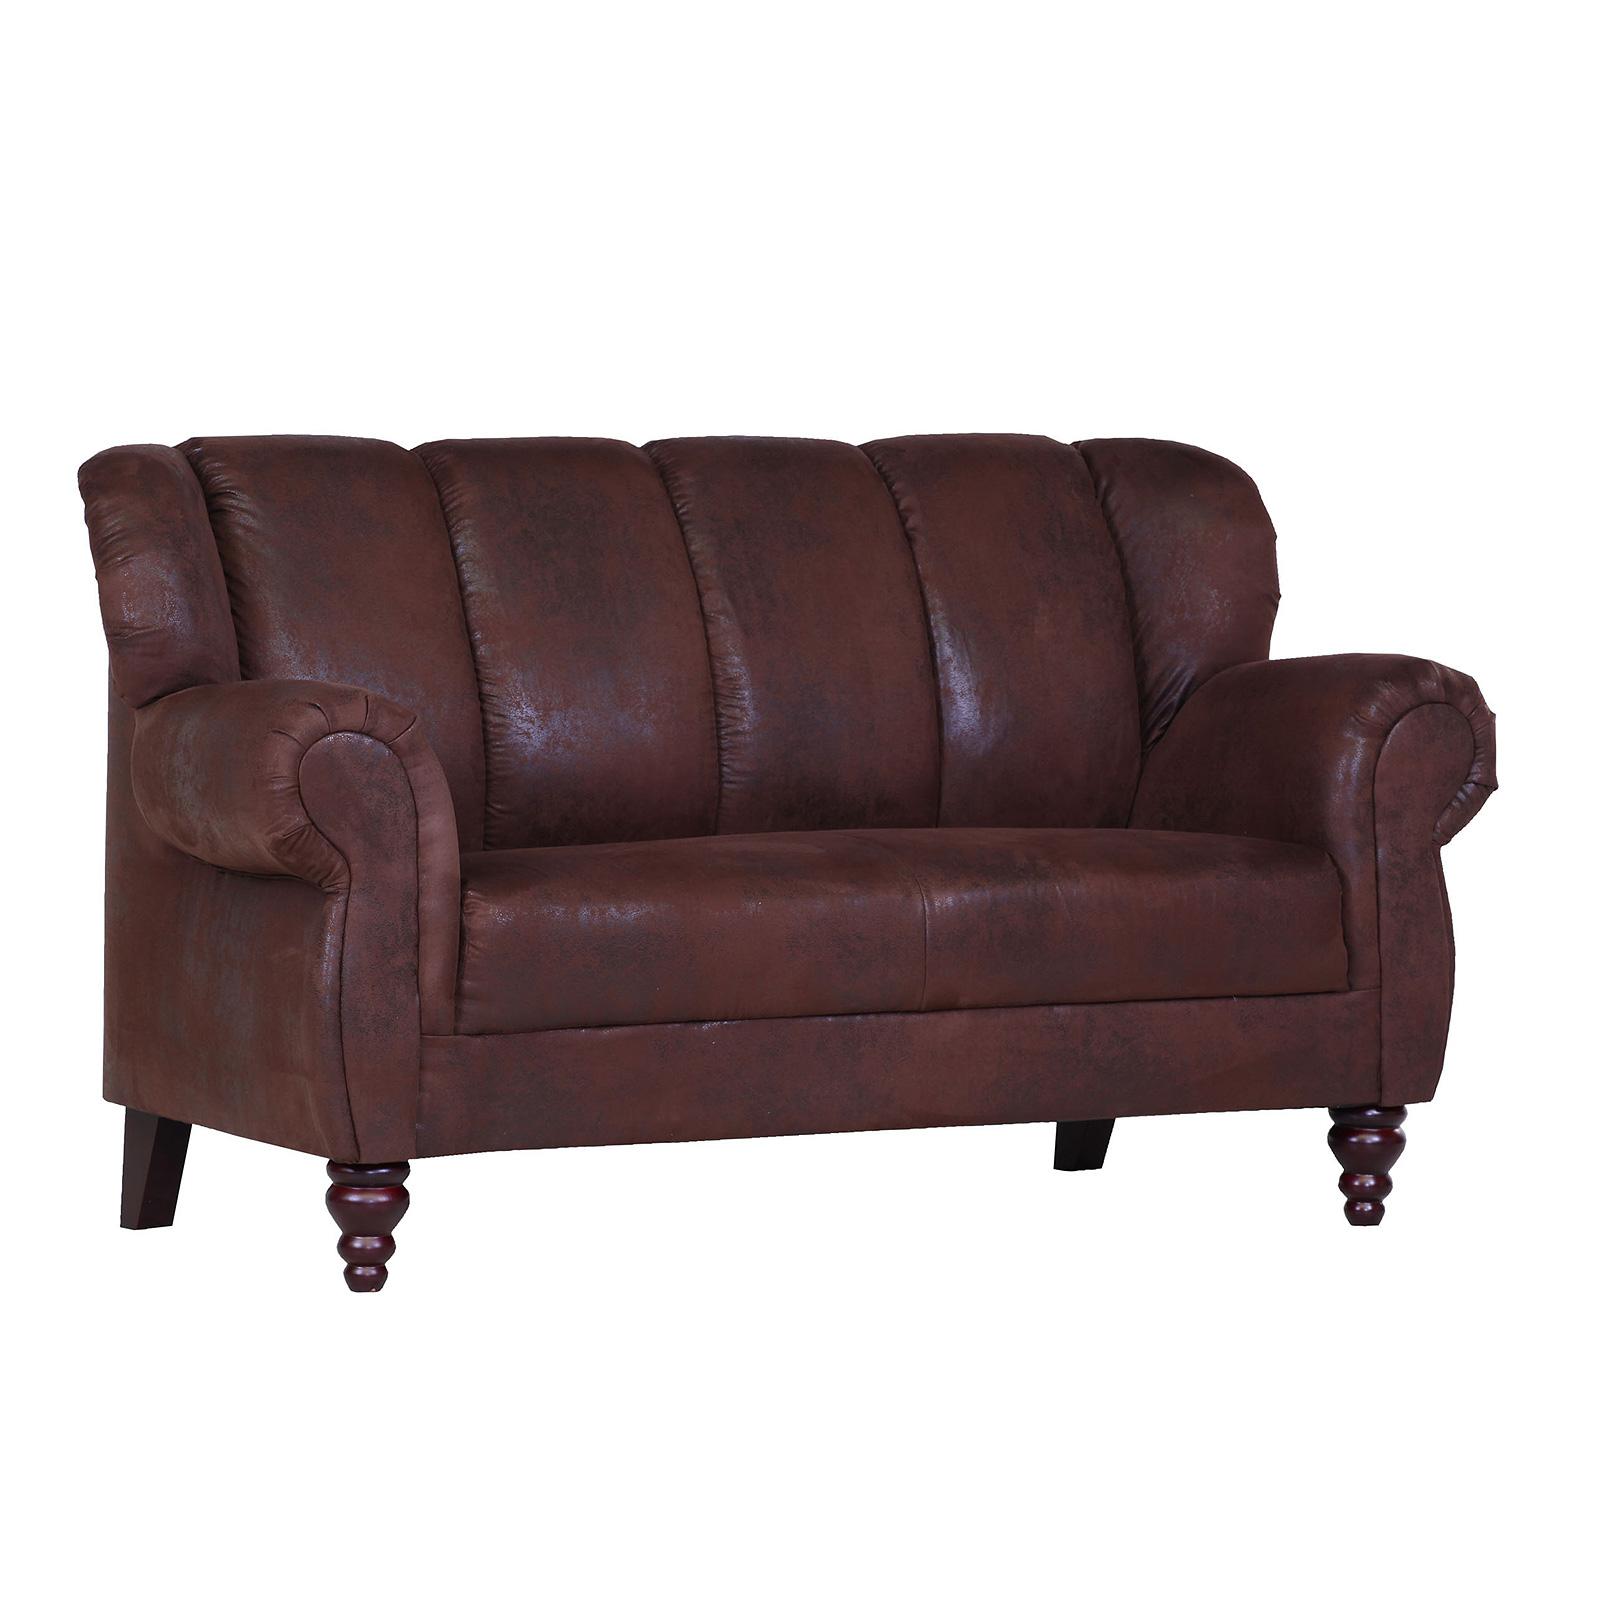 2 sitzer sofa mit collection ab pfiffiges sitzersofa mit lustigen with 2 sitzer sofa mit free. Black Bedroom Furniture Sets. Home Design Ideas